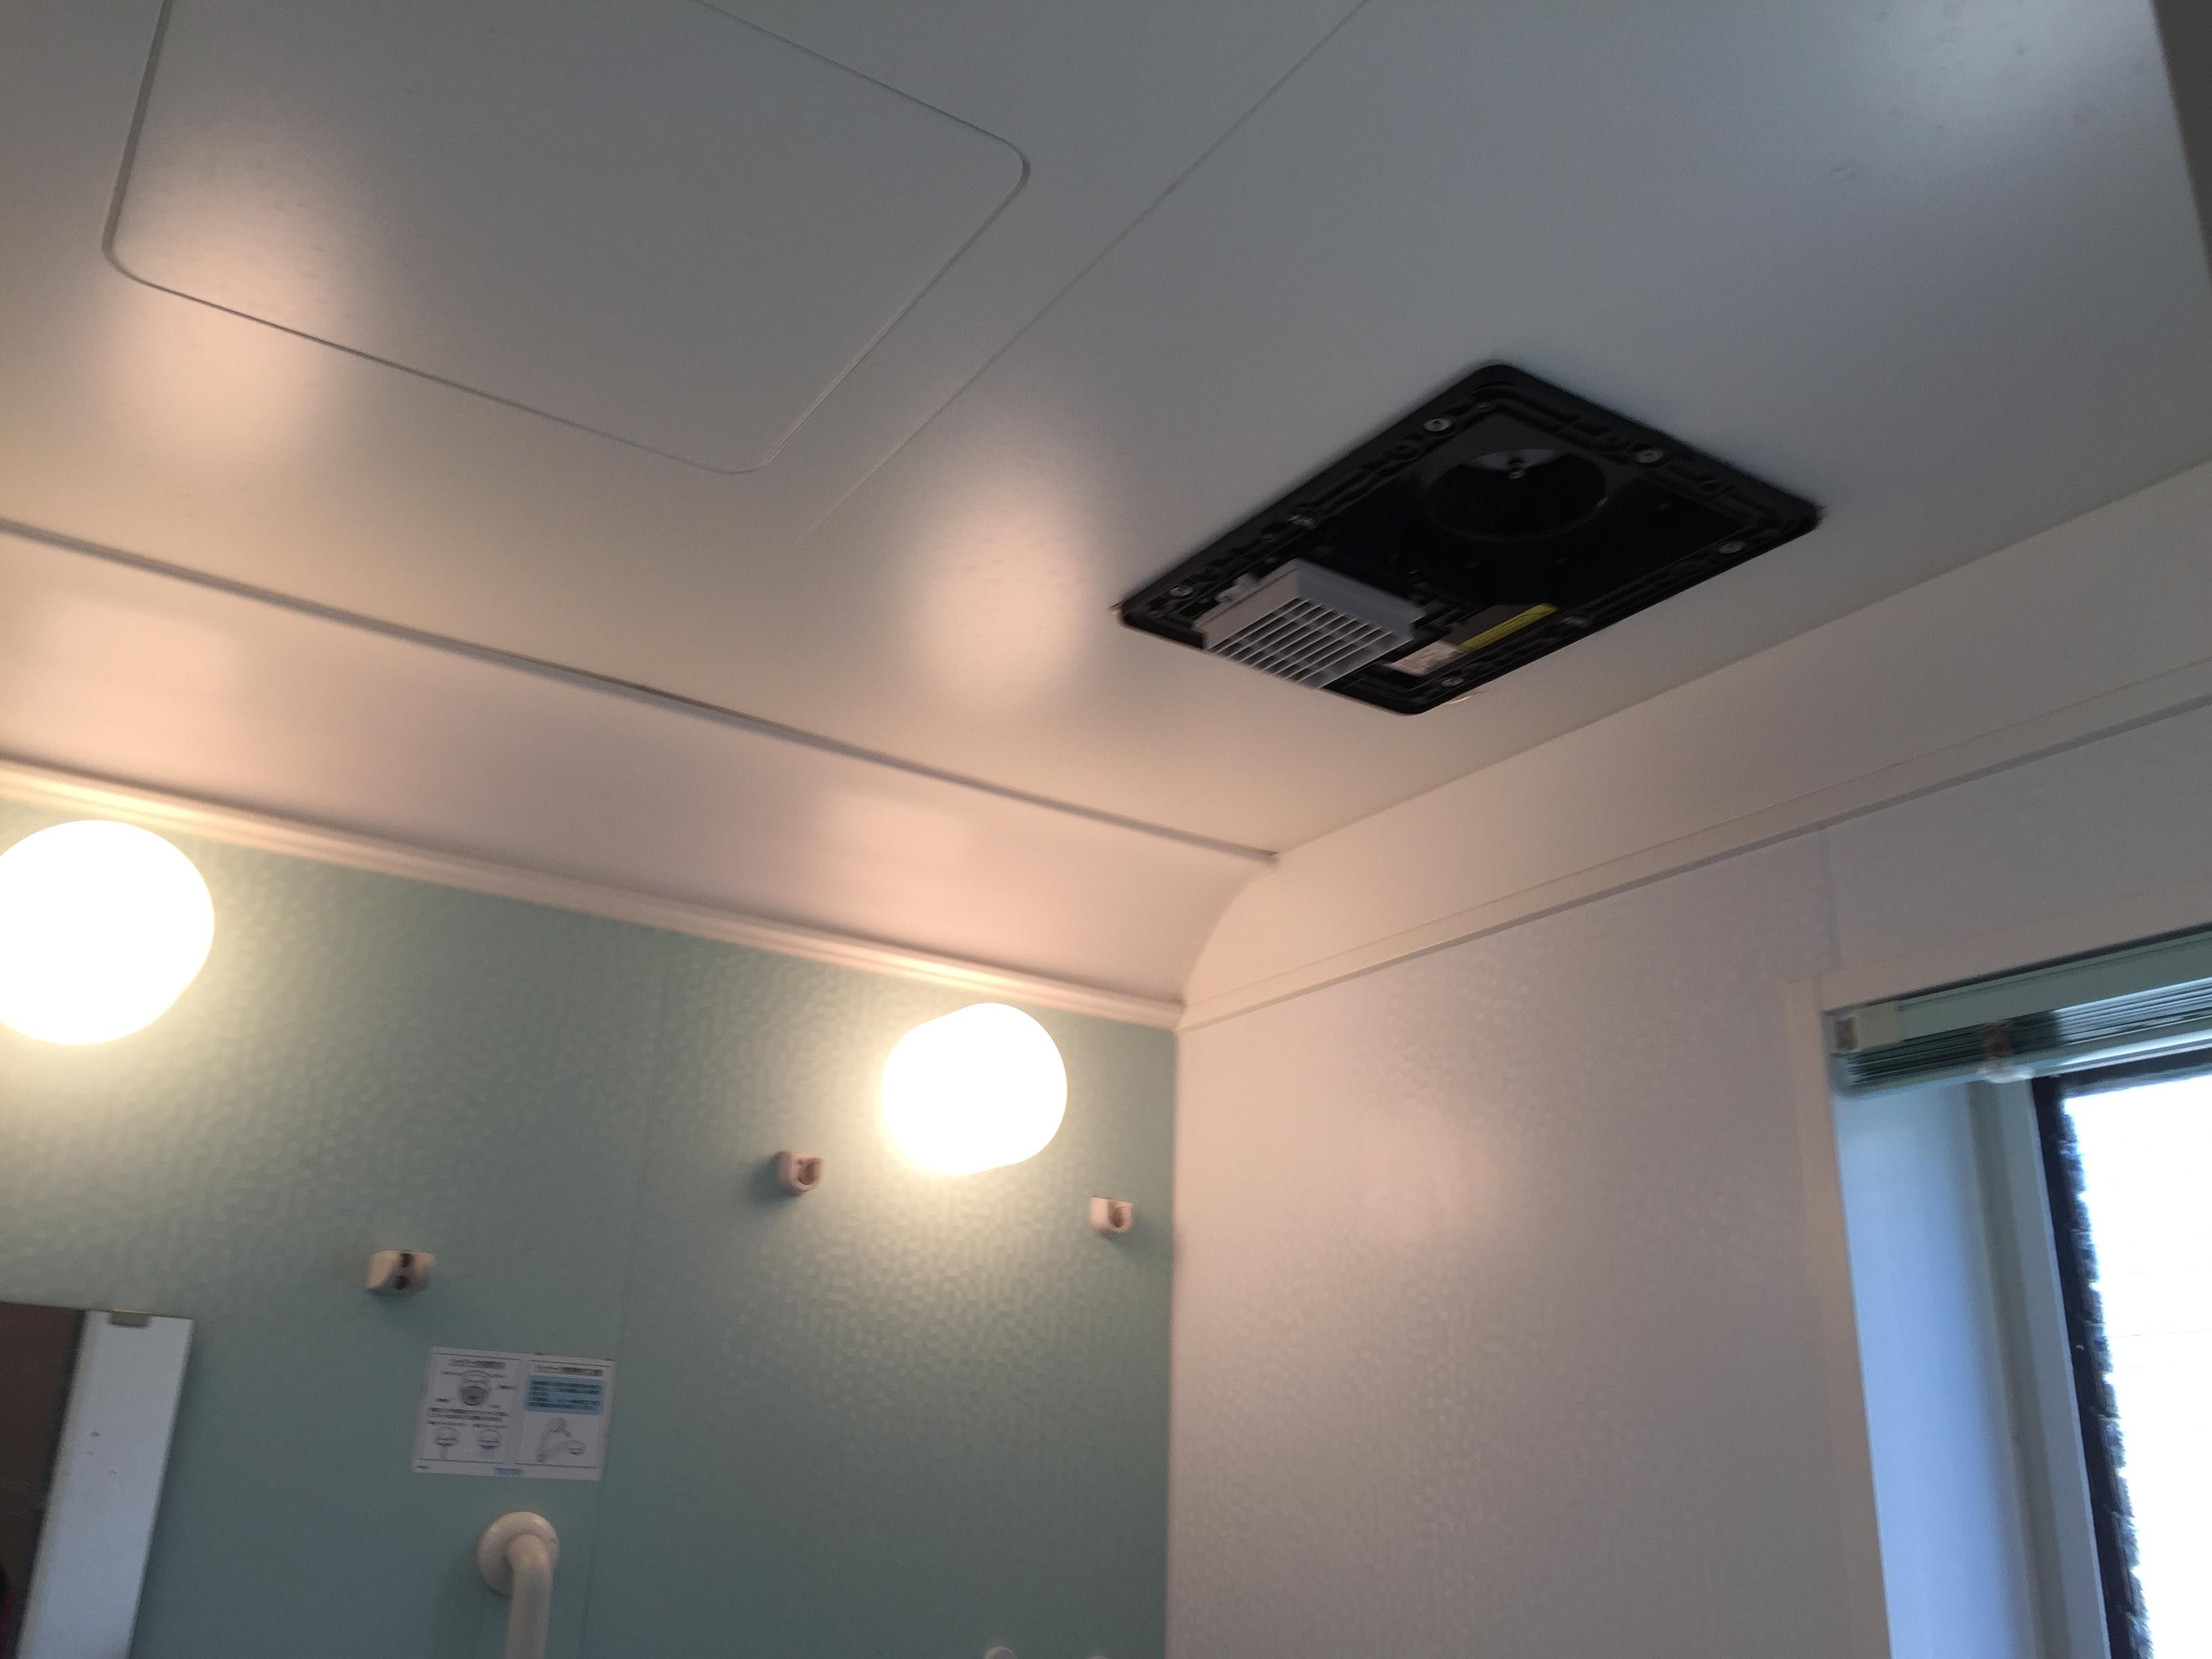 TOTO浴室換気暖房乾燥機の故障と修理に掛かる費用